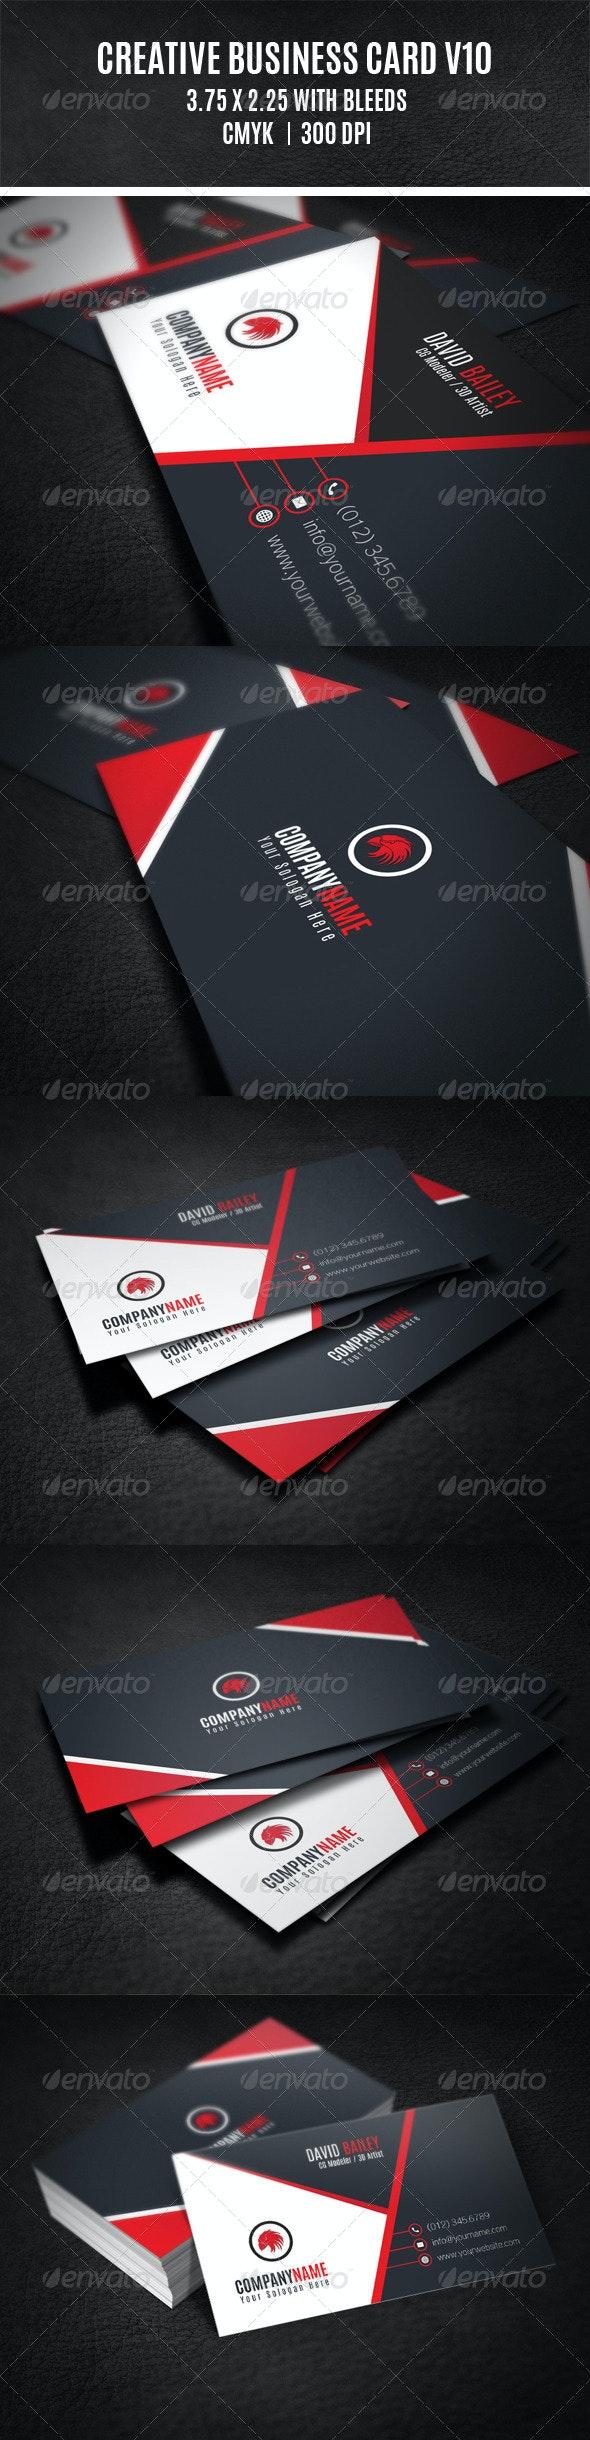 Creative Business Card V10 - Creative Business Cards